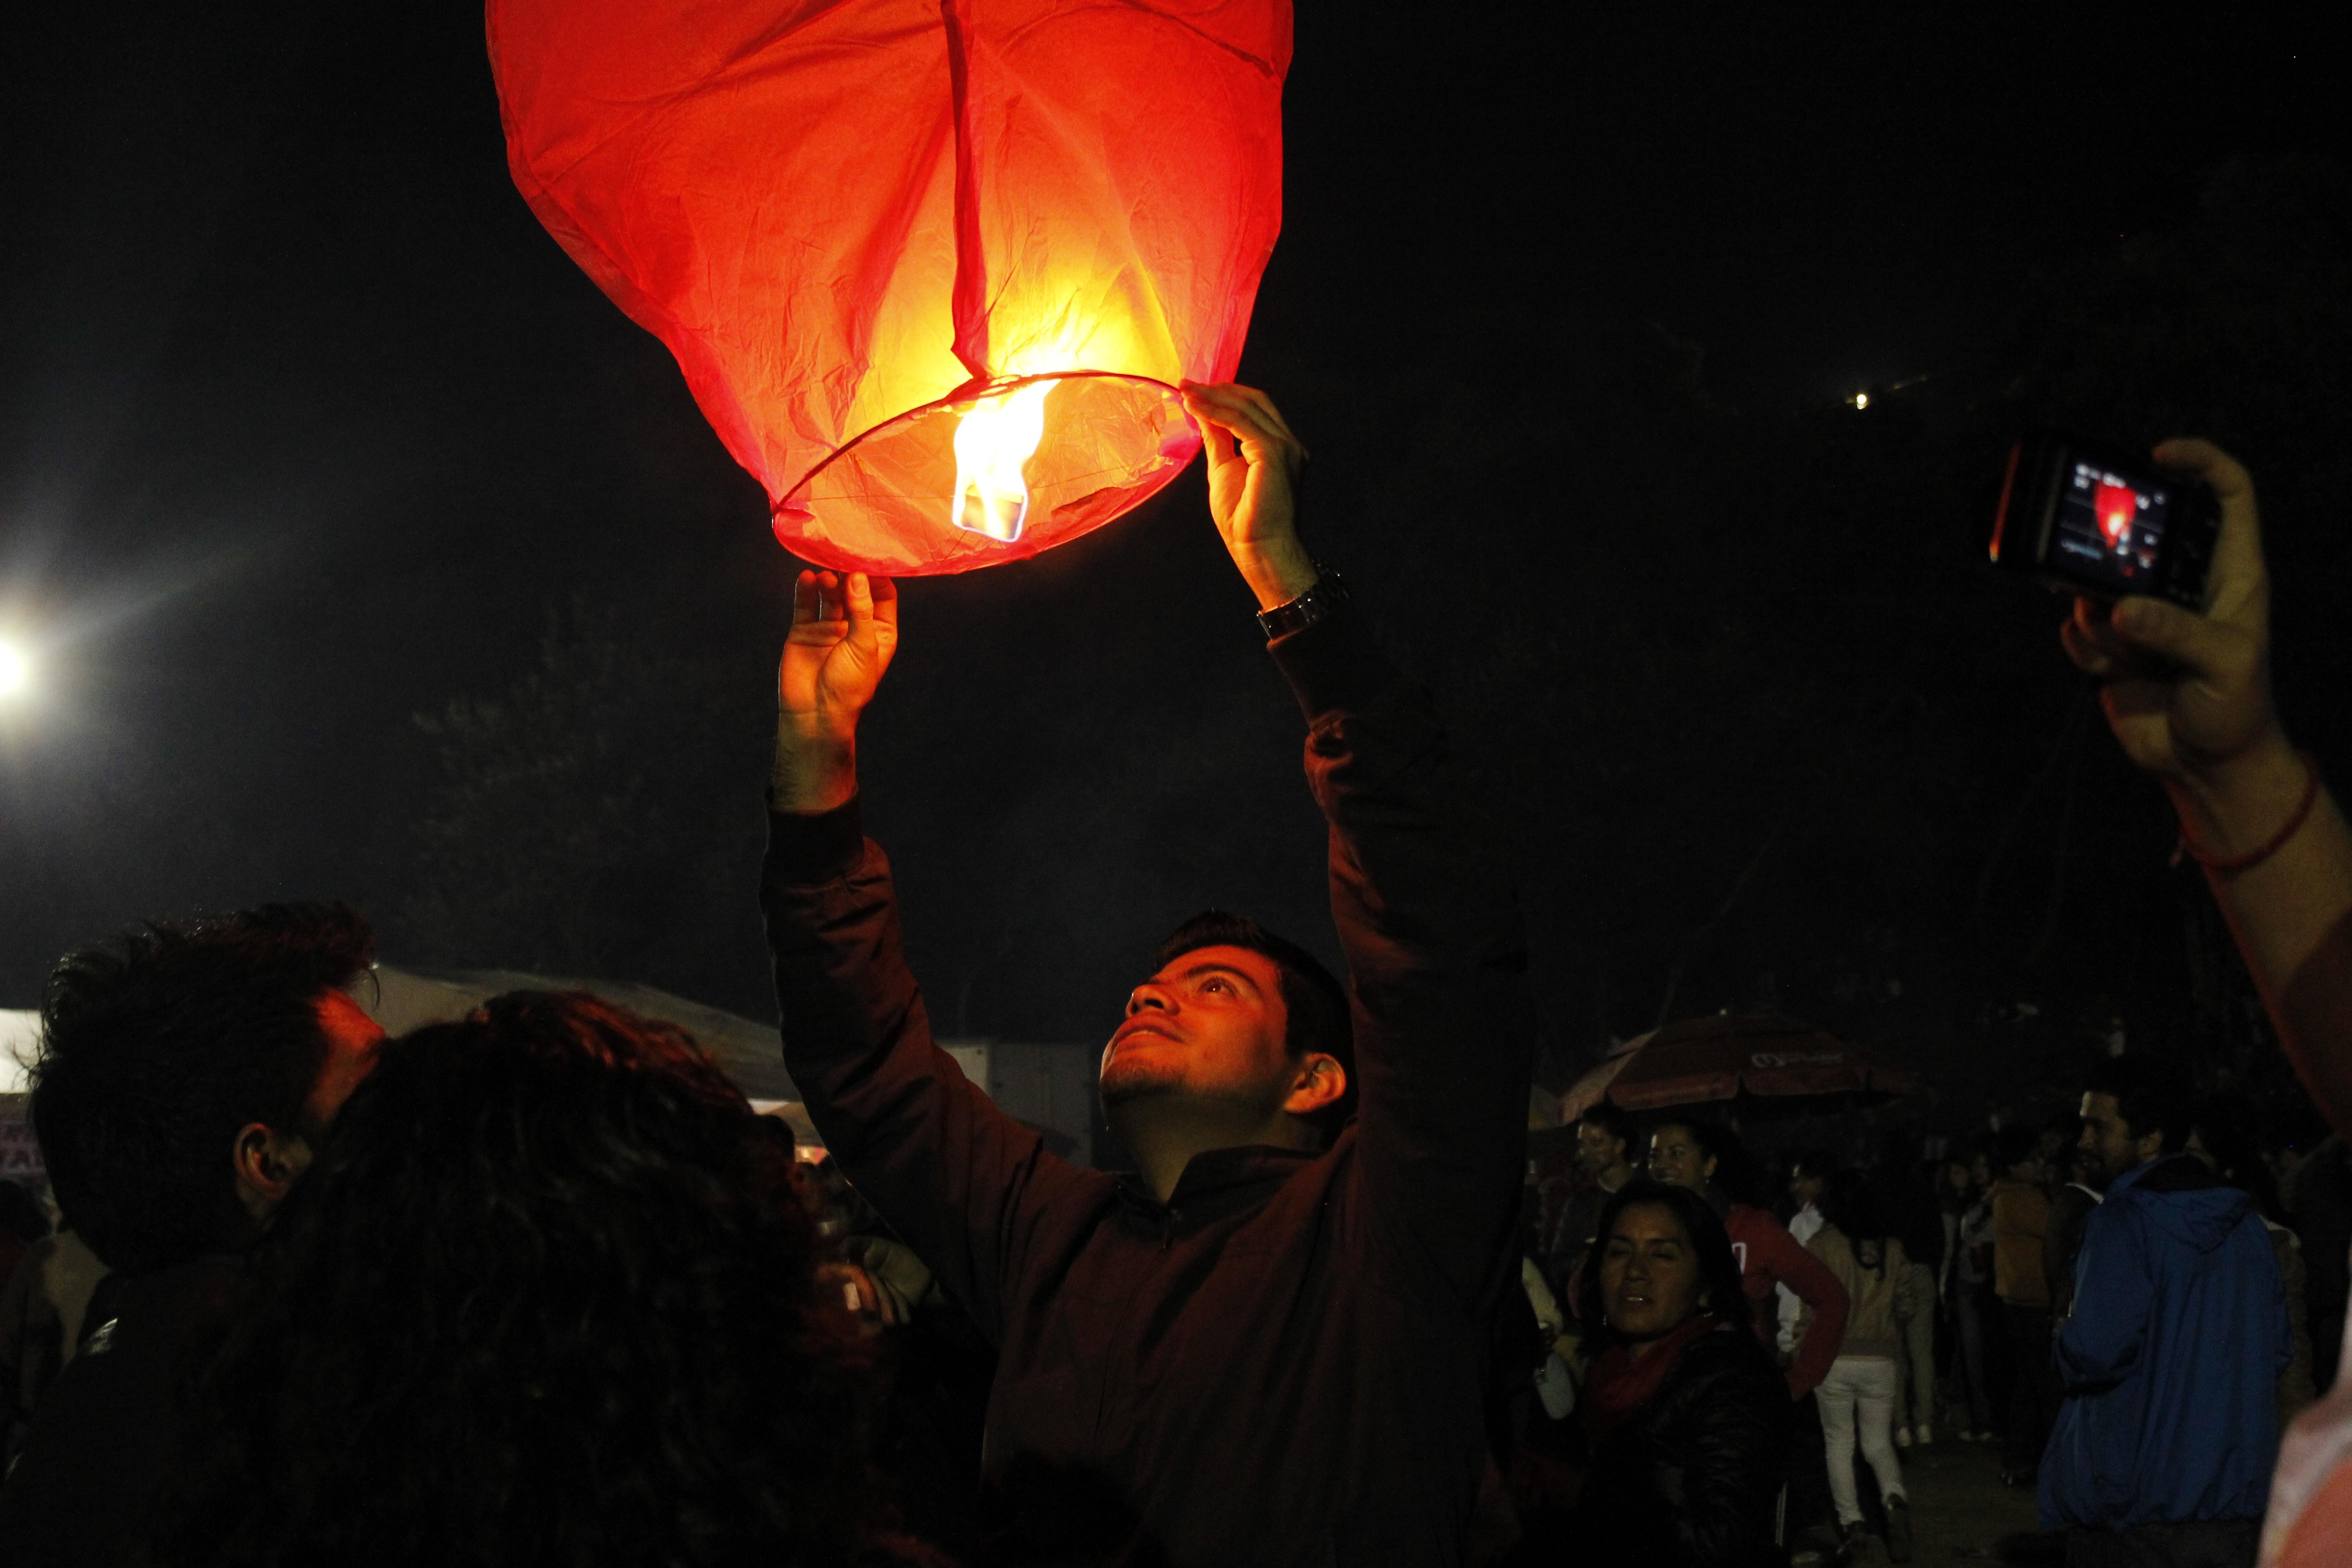 Lamp, Activity, Air, Balloon, Fly, HQ Photo